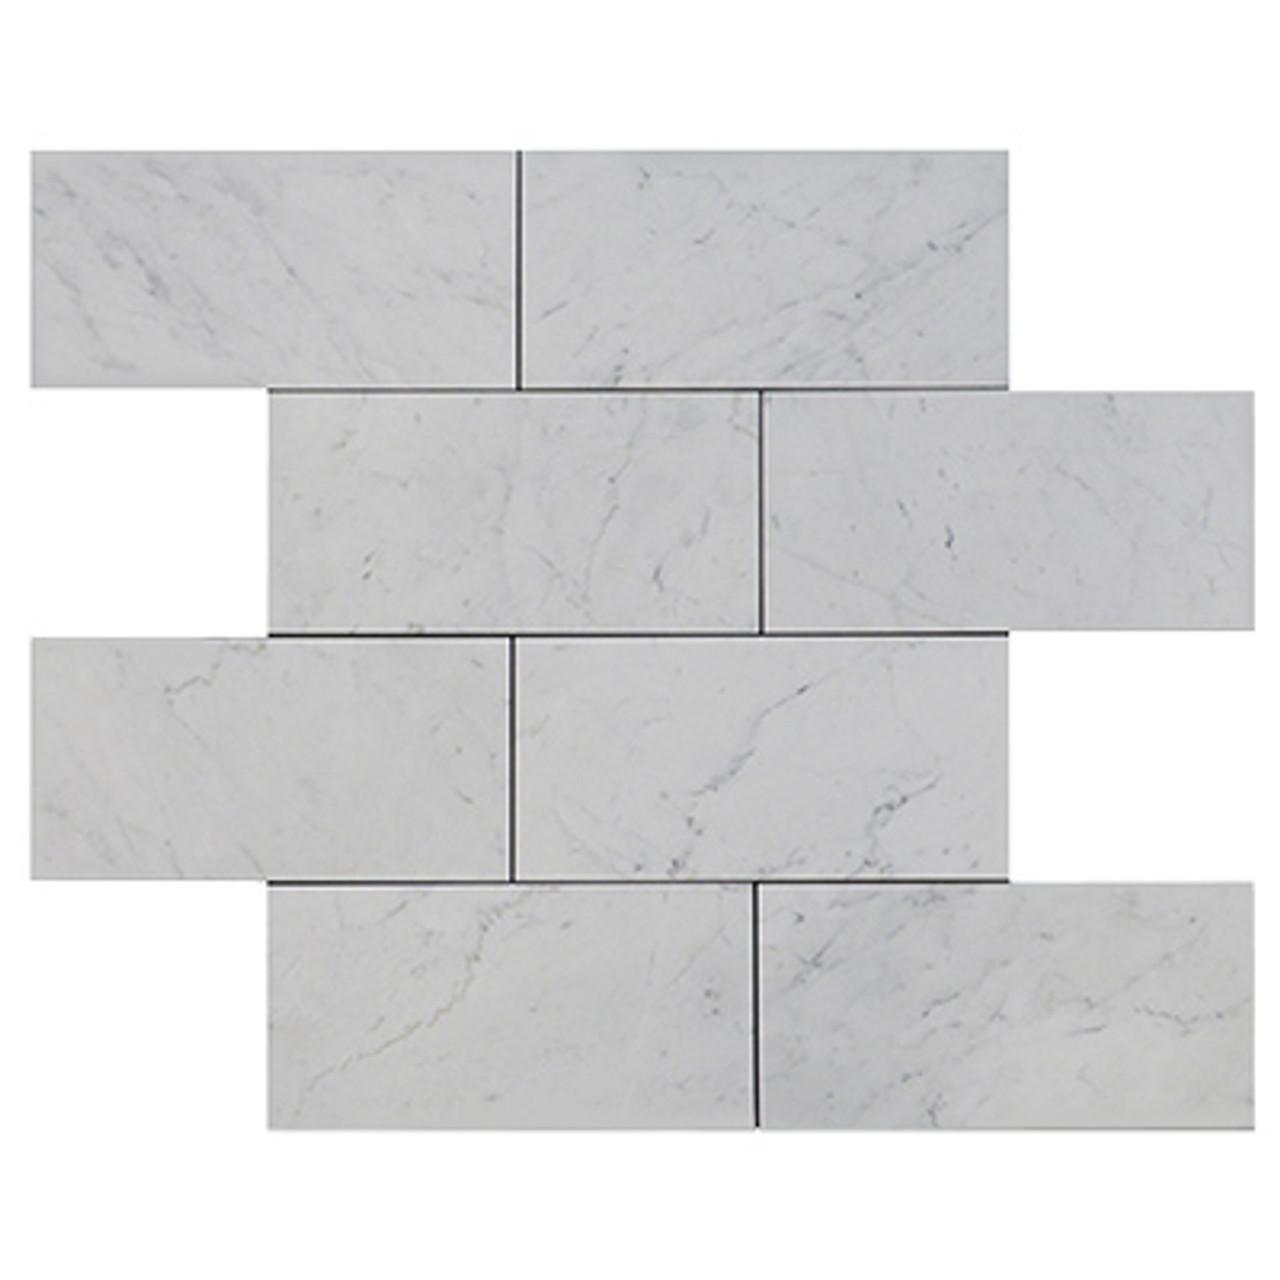 Bianco Carrara Polished Marble 12 x 12 Tile White Carrera